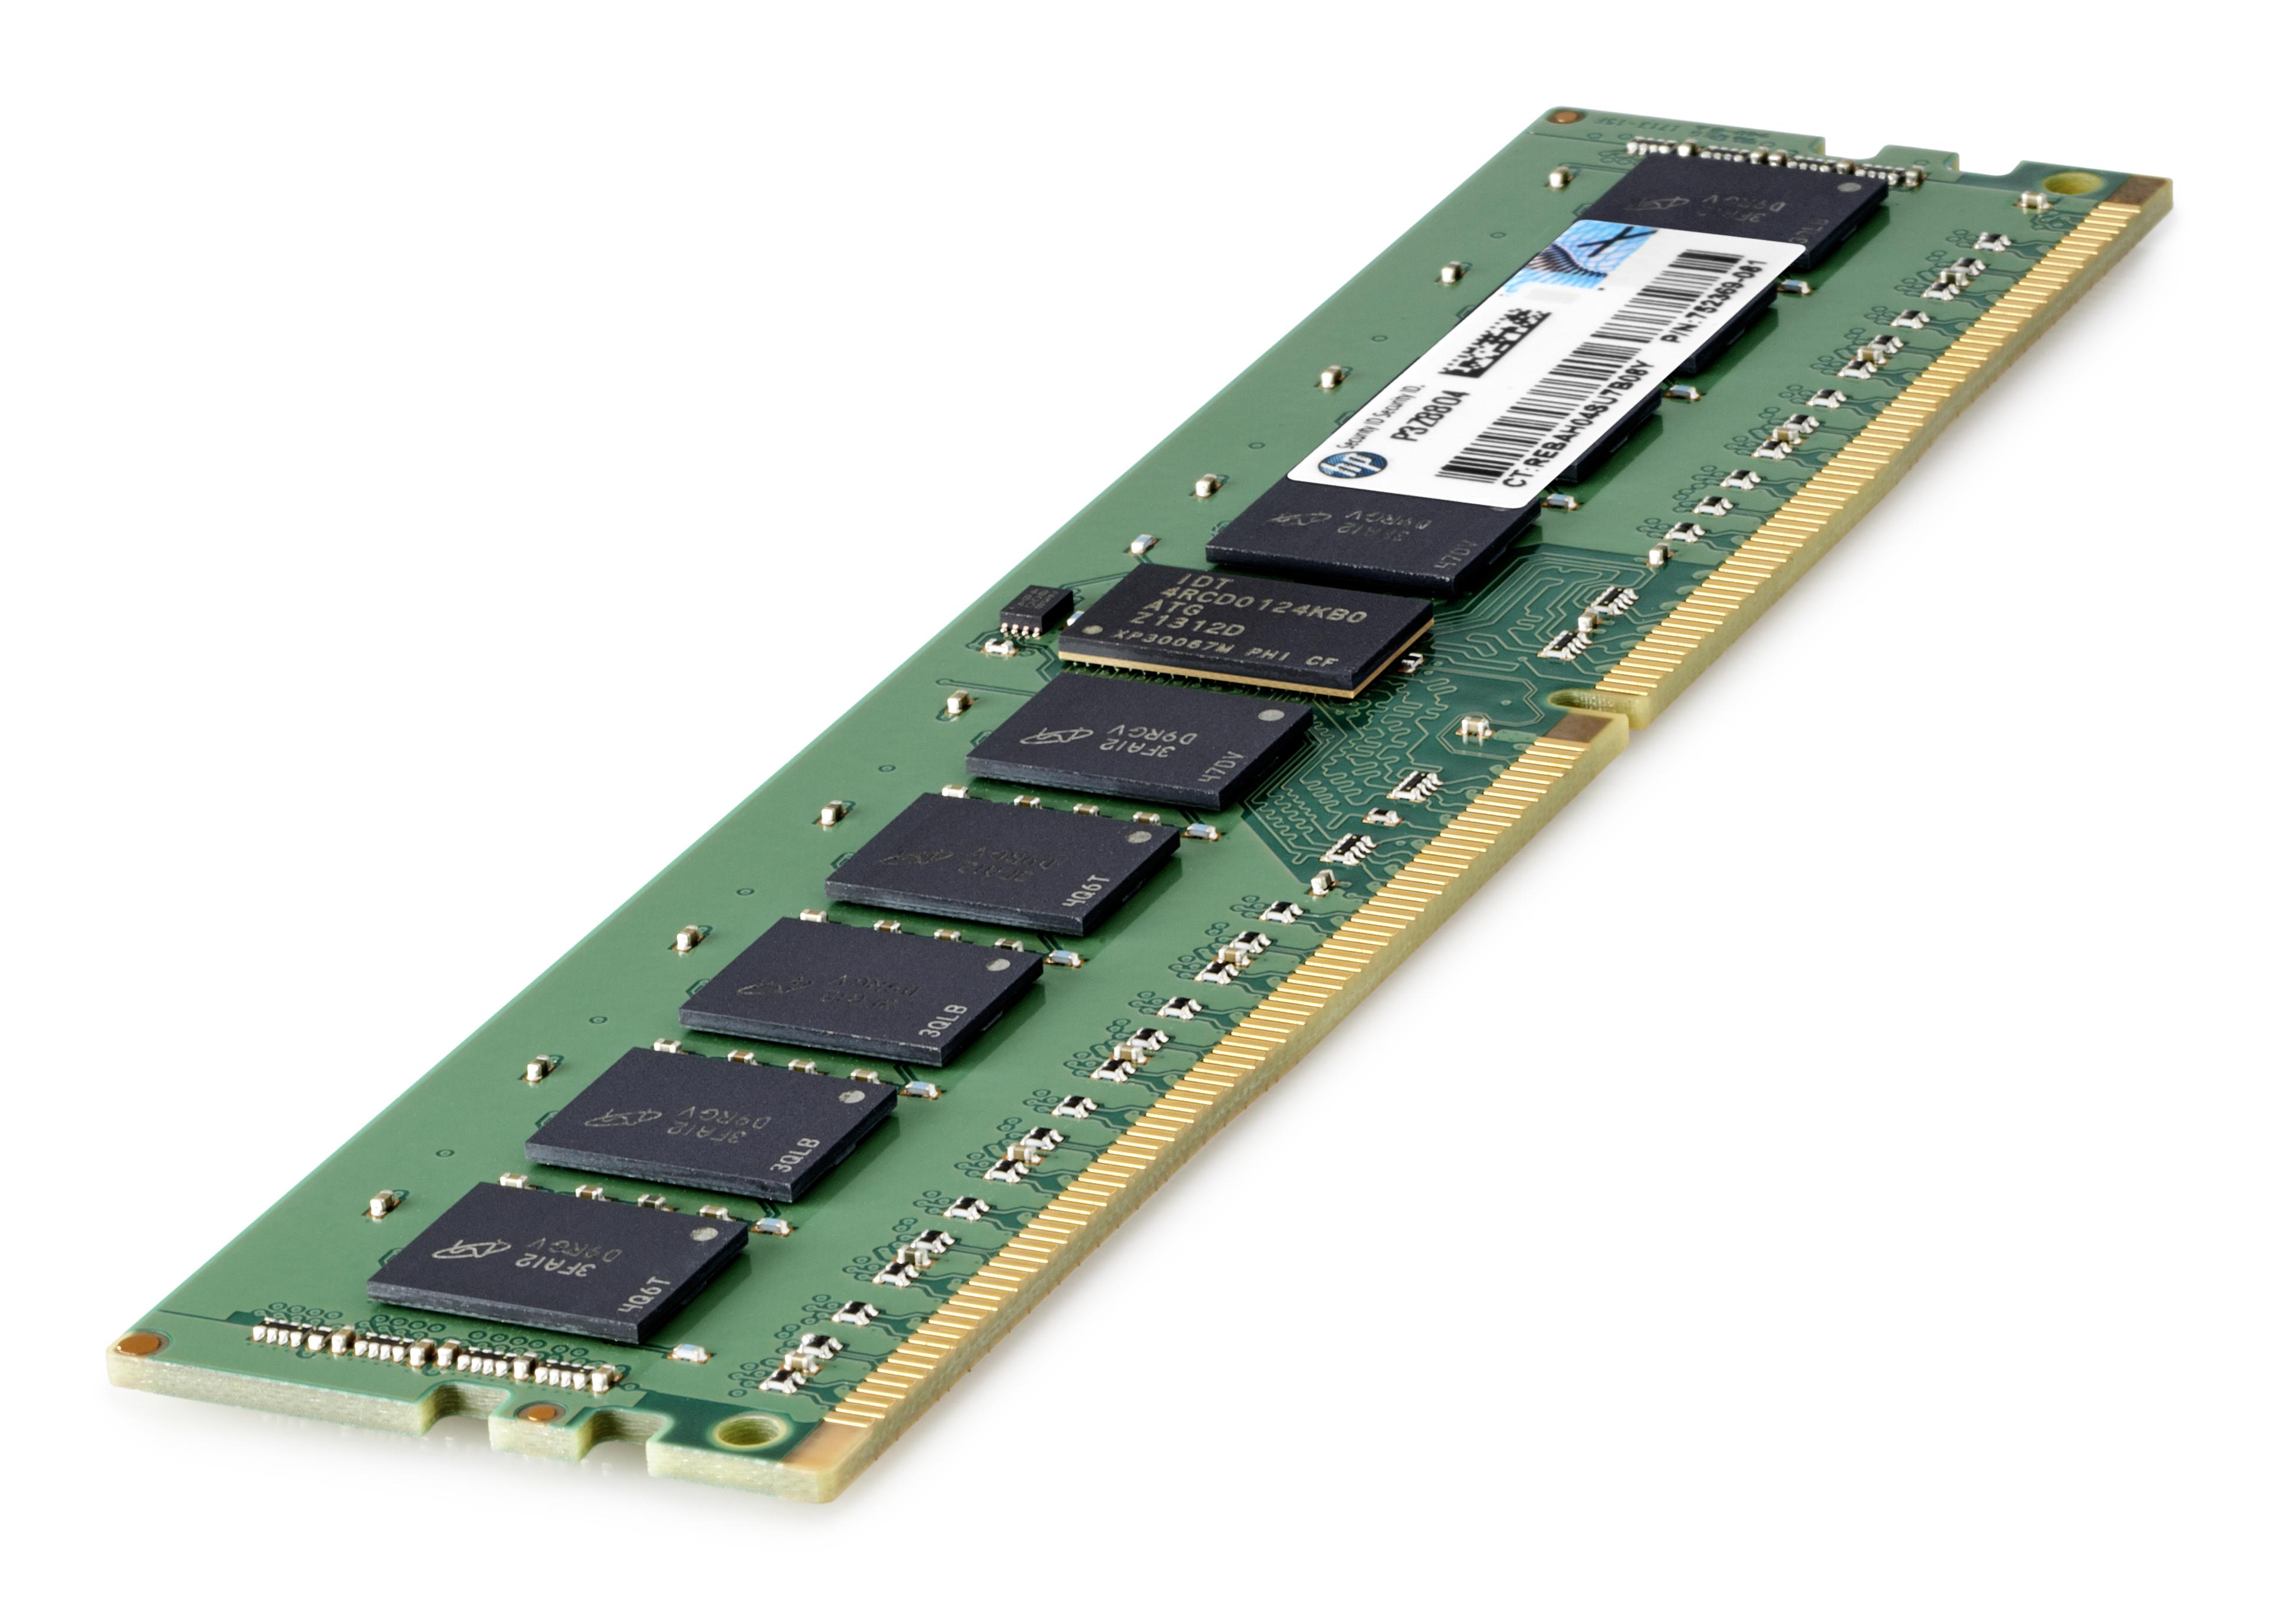 Hewlett Packard Enterprise 726719-B21 16GB DDR4 2133MHz memory module